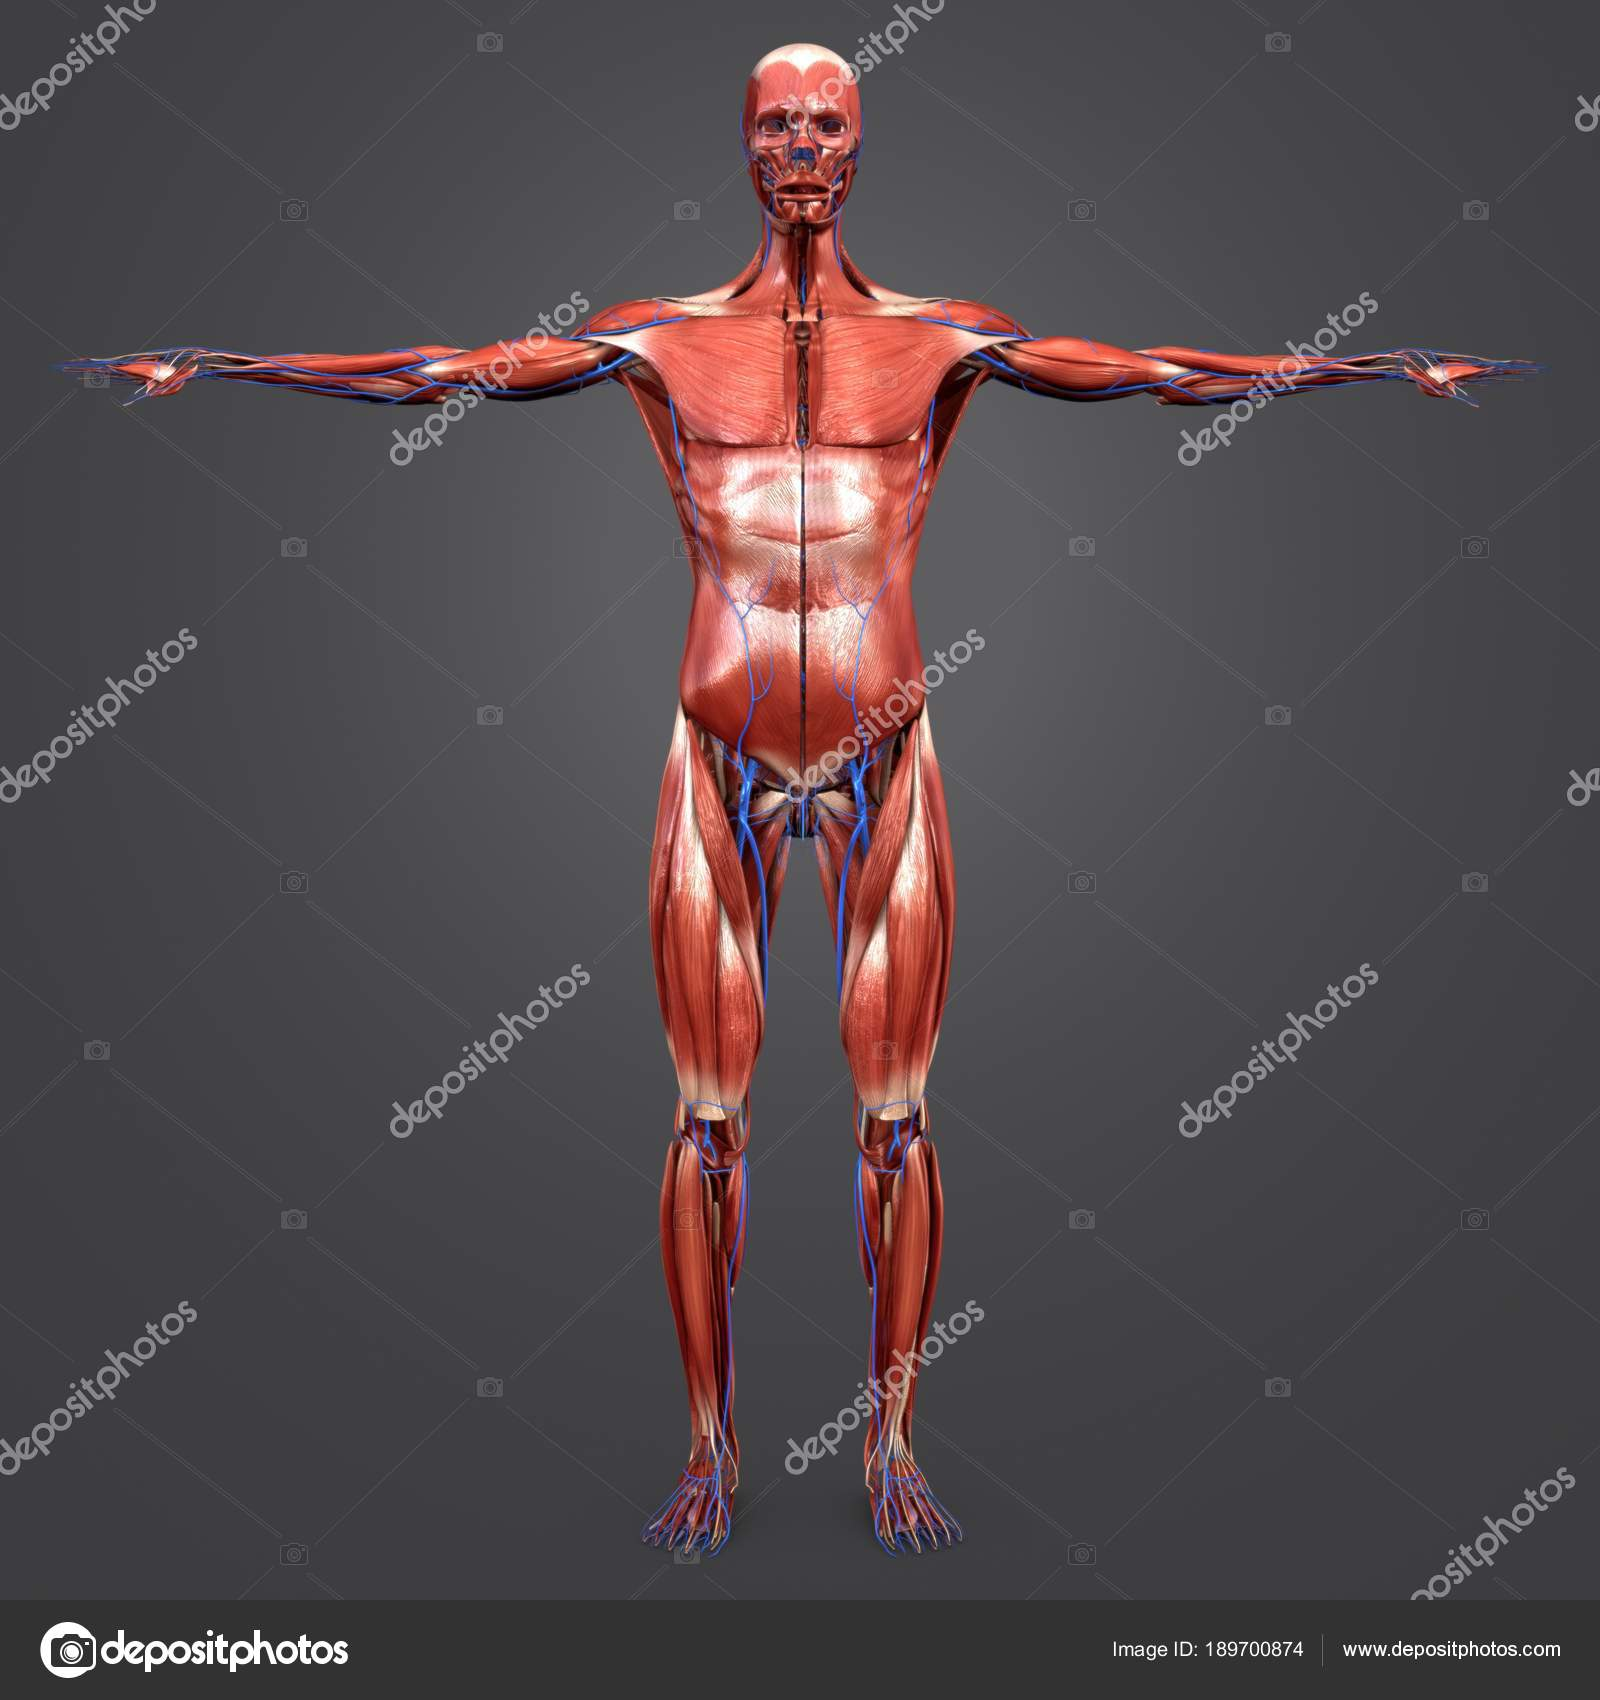 Colorful Medical Illustration Human Muscular Anatomy Veins — Stock ...